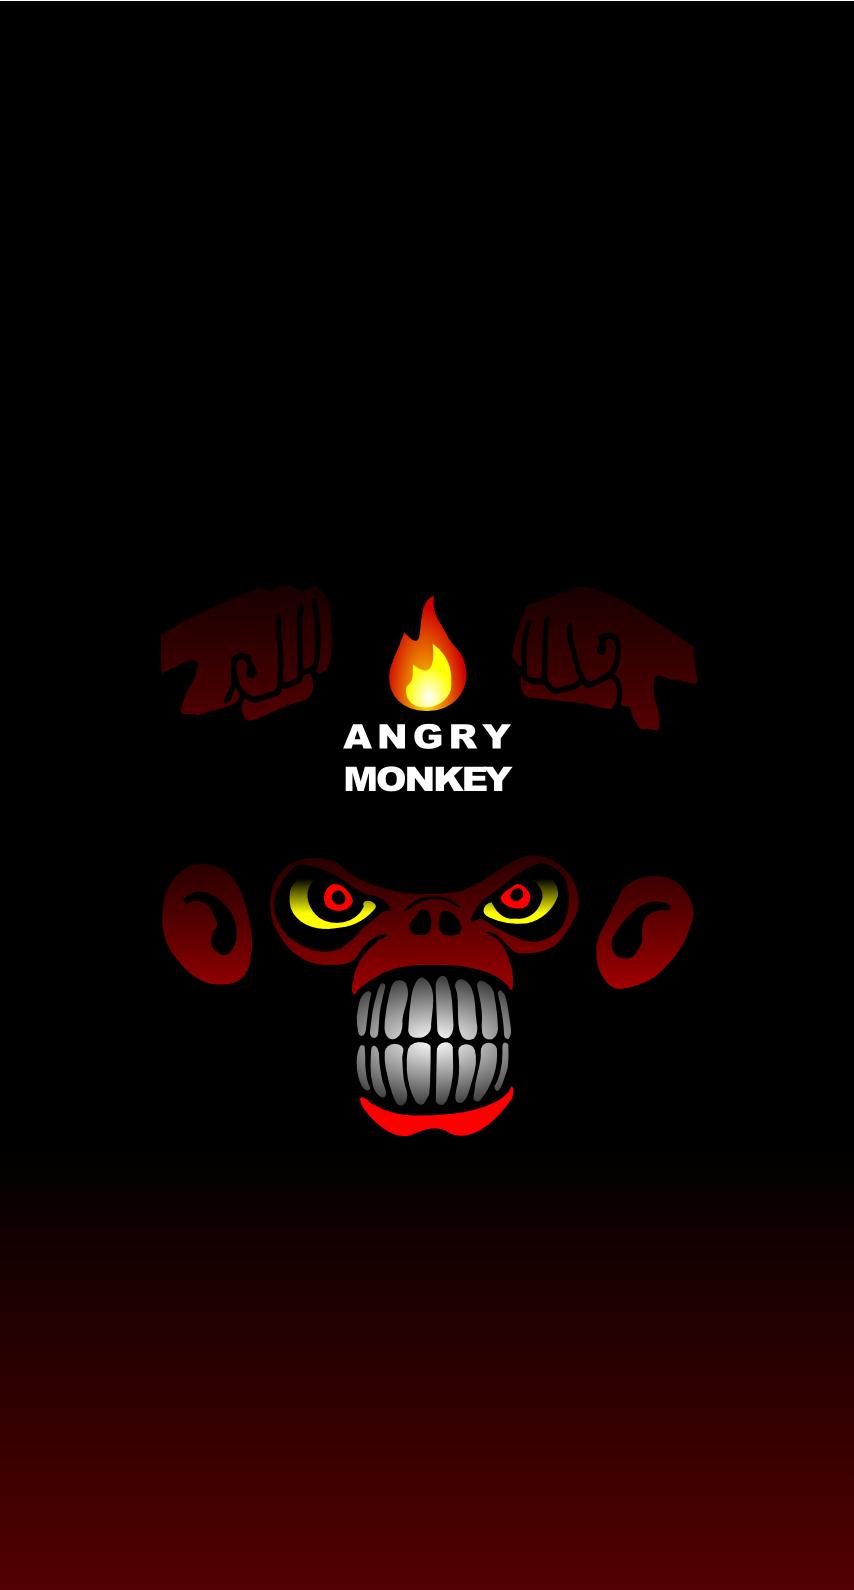 Angry_monkeysvg